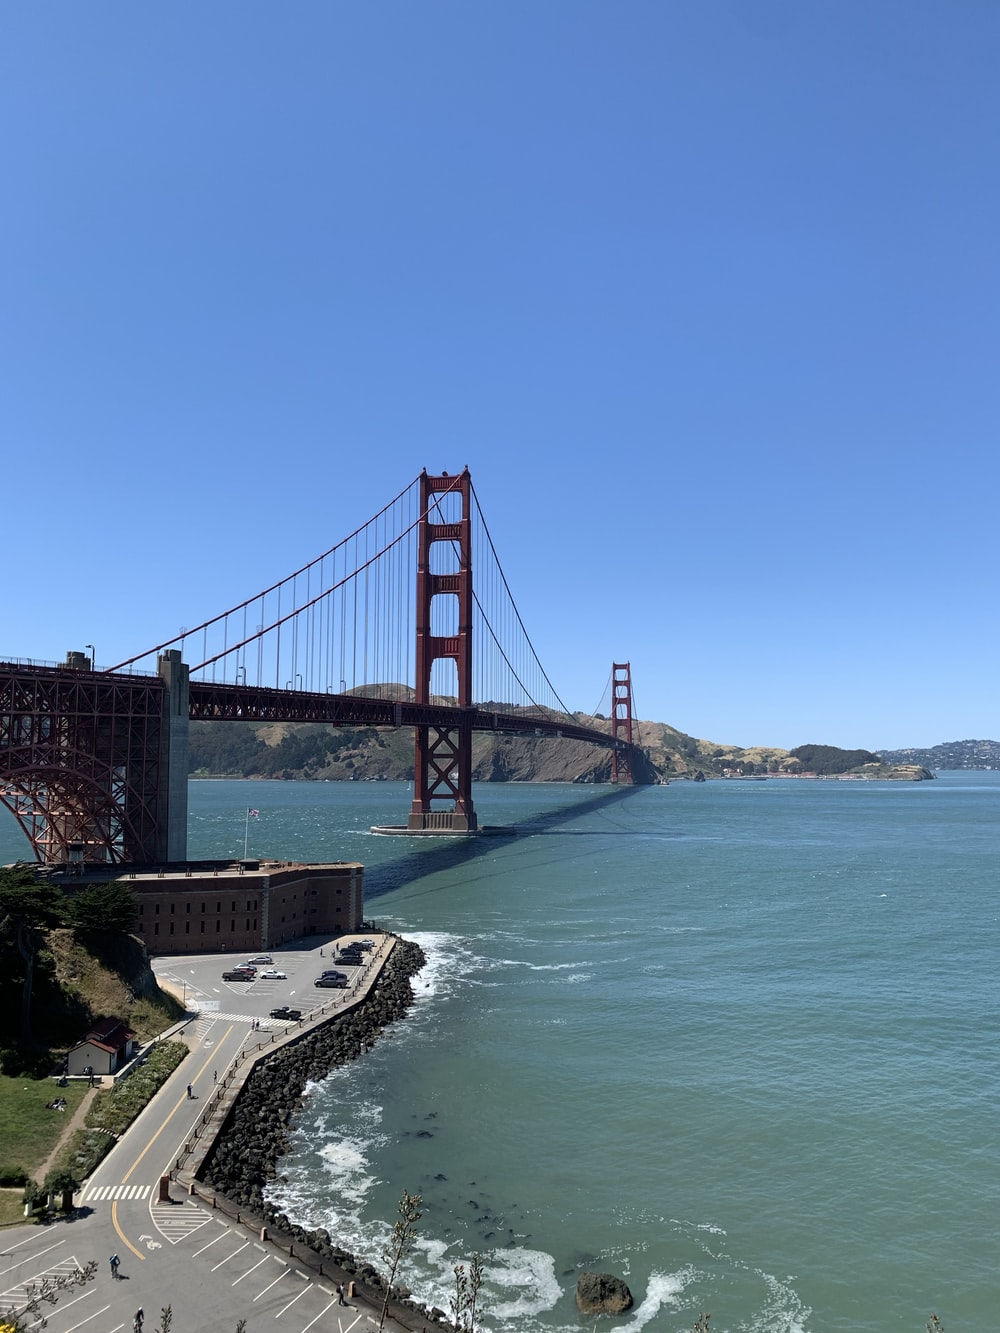 Golden Gate Bridge in San Francisco during daytime